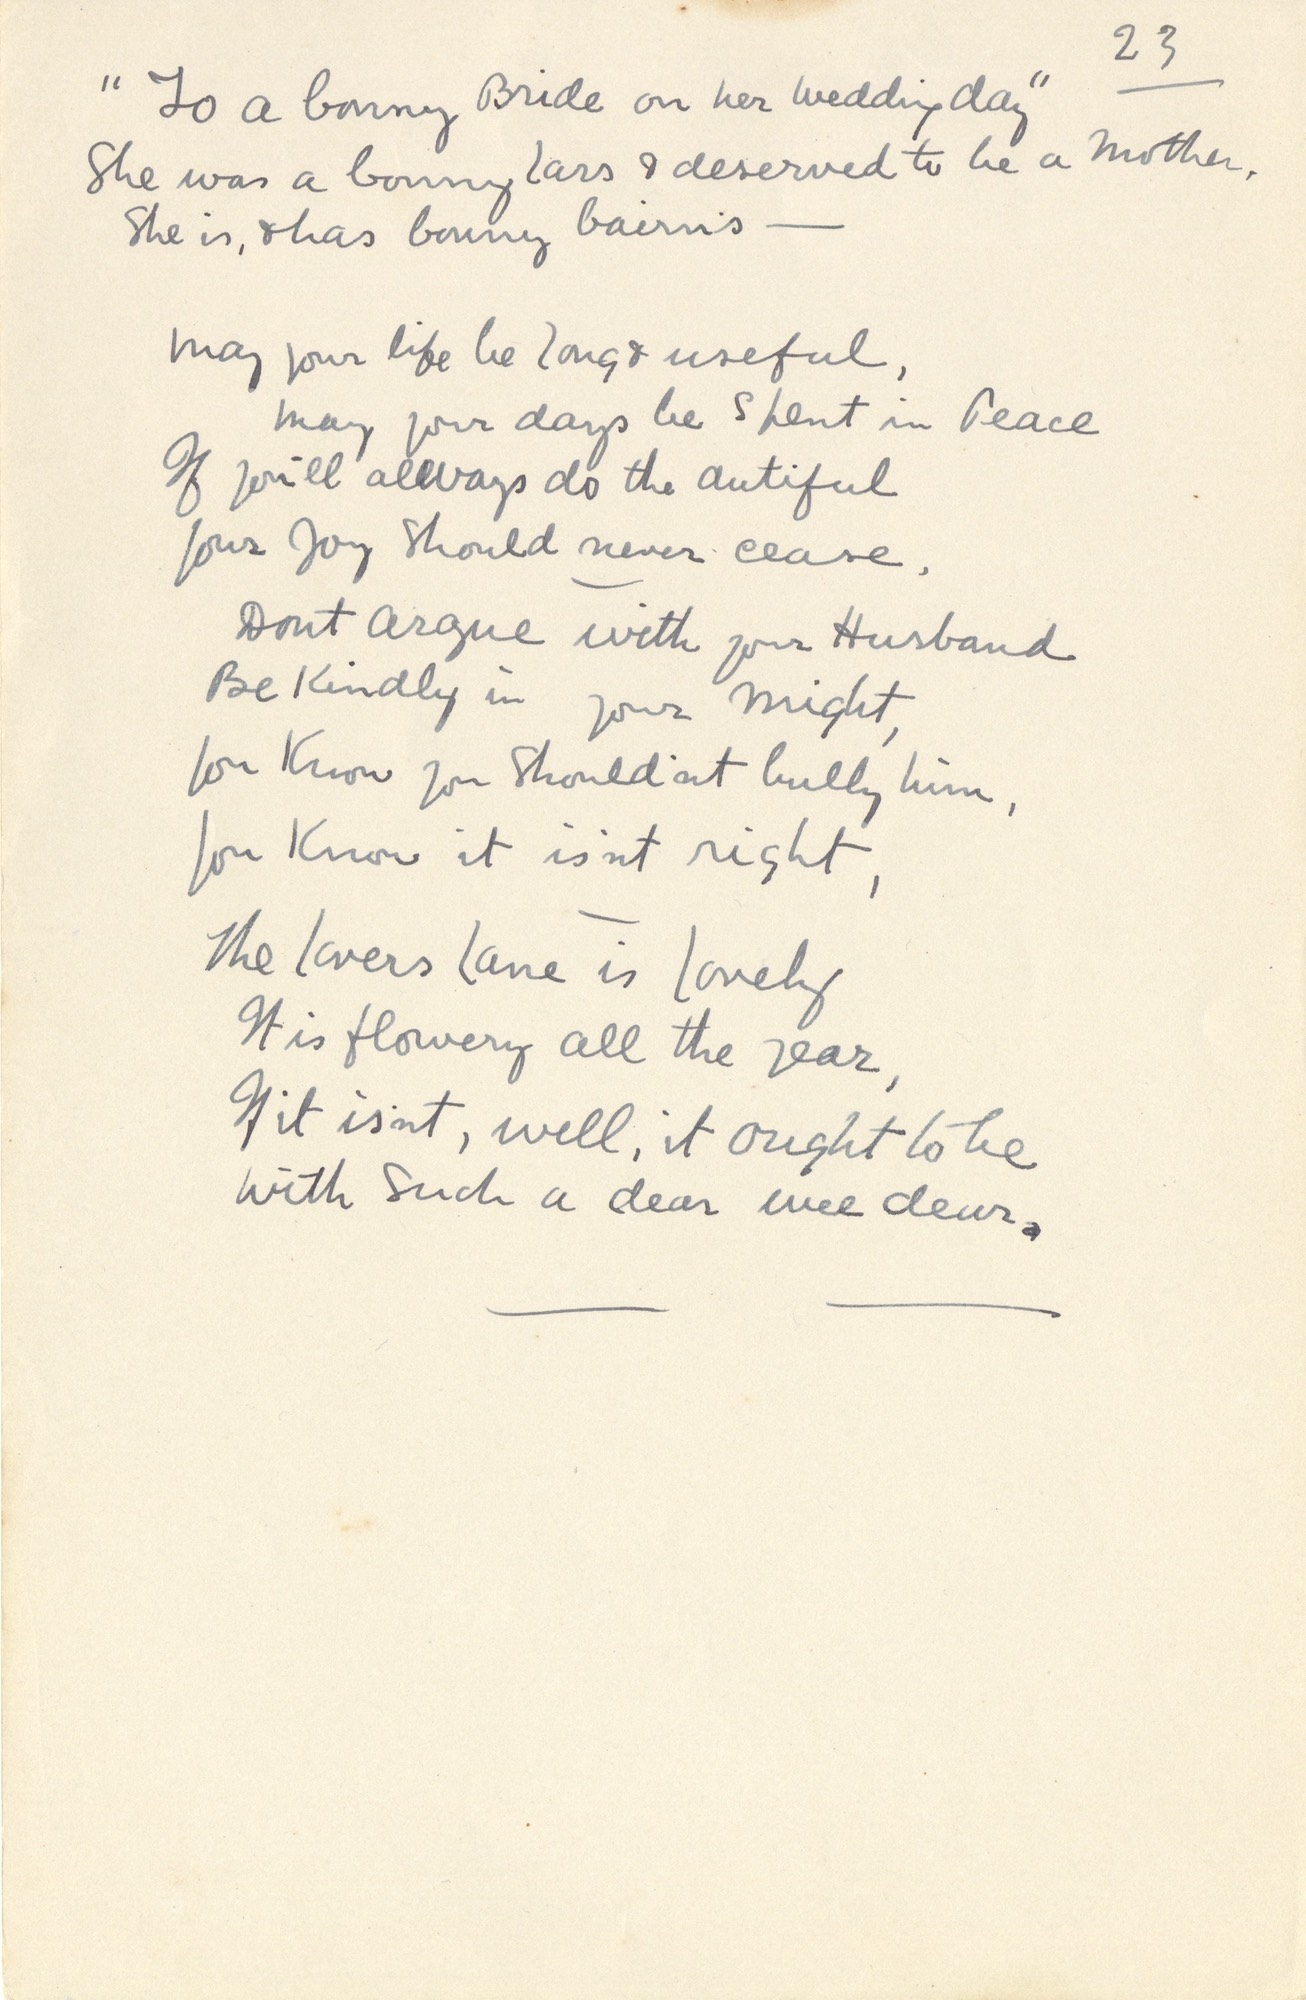 Wedding Day Letter To Bride.Handwritten Verse To A Bonny Bride On Her Wedding Day No 23